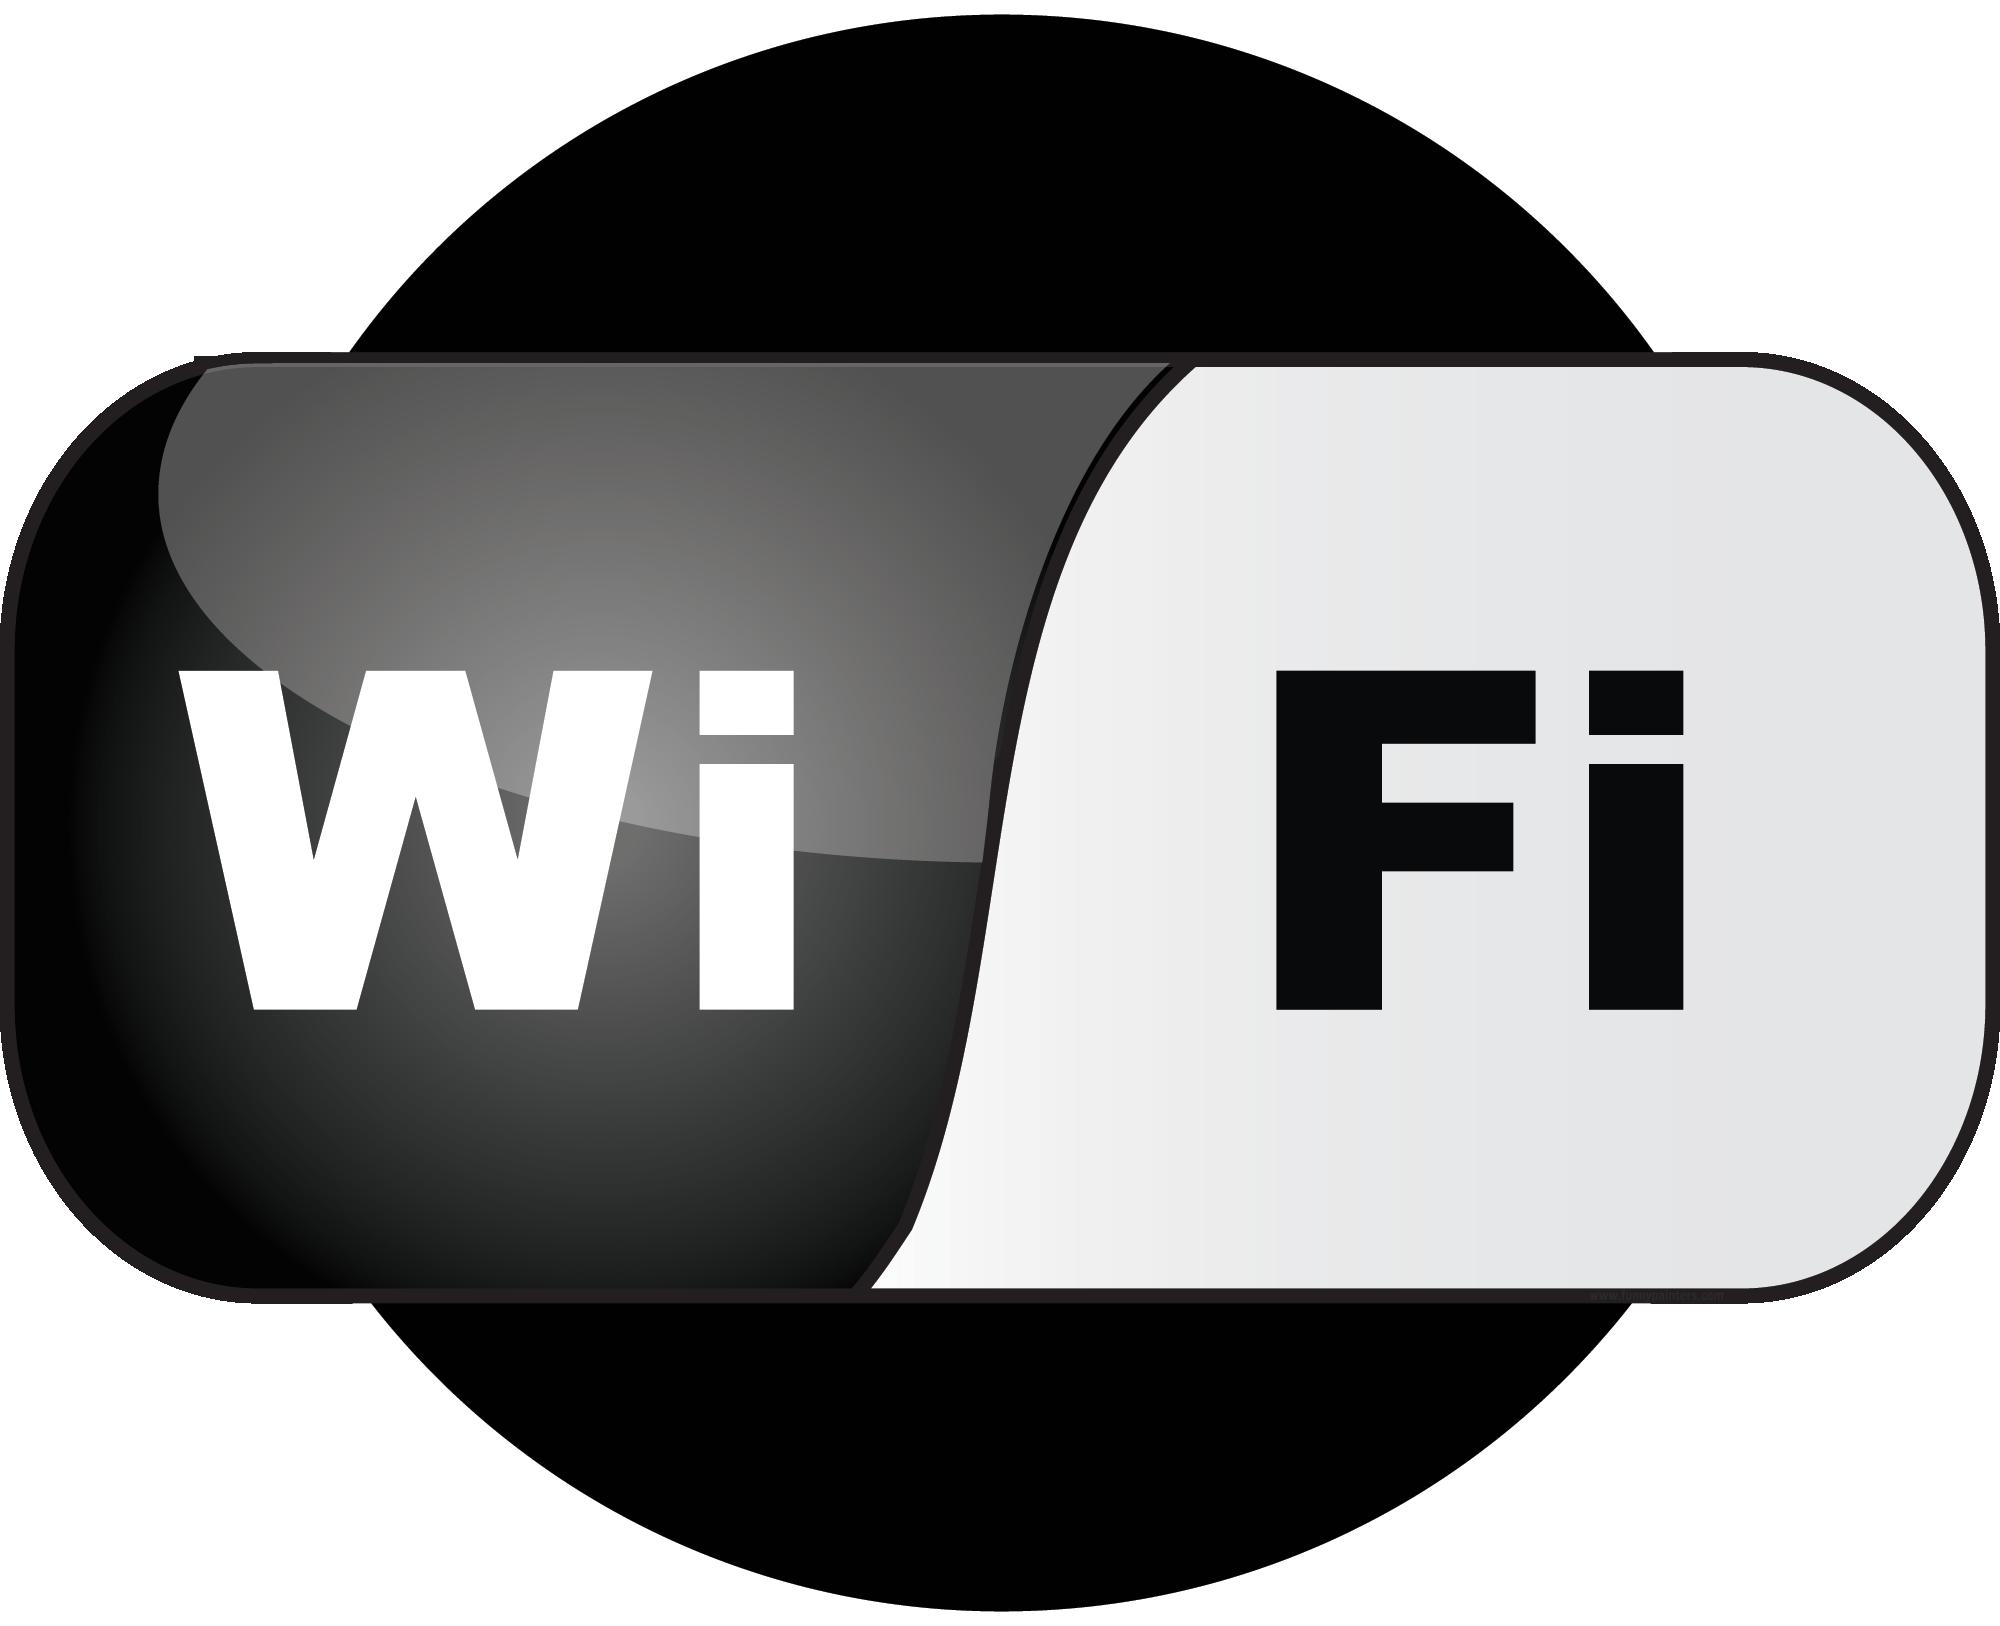 Pubg Hd Png Logo: Wifi Icon PNG Image - PurePNG